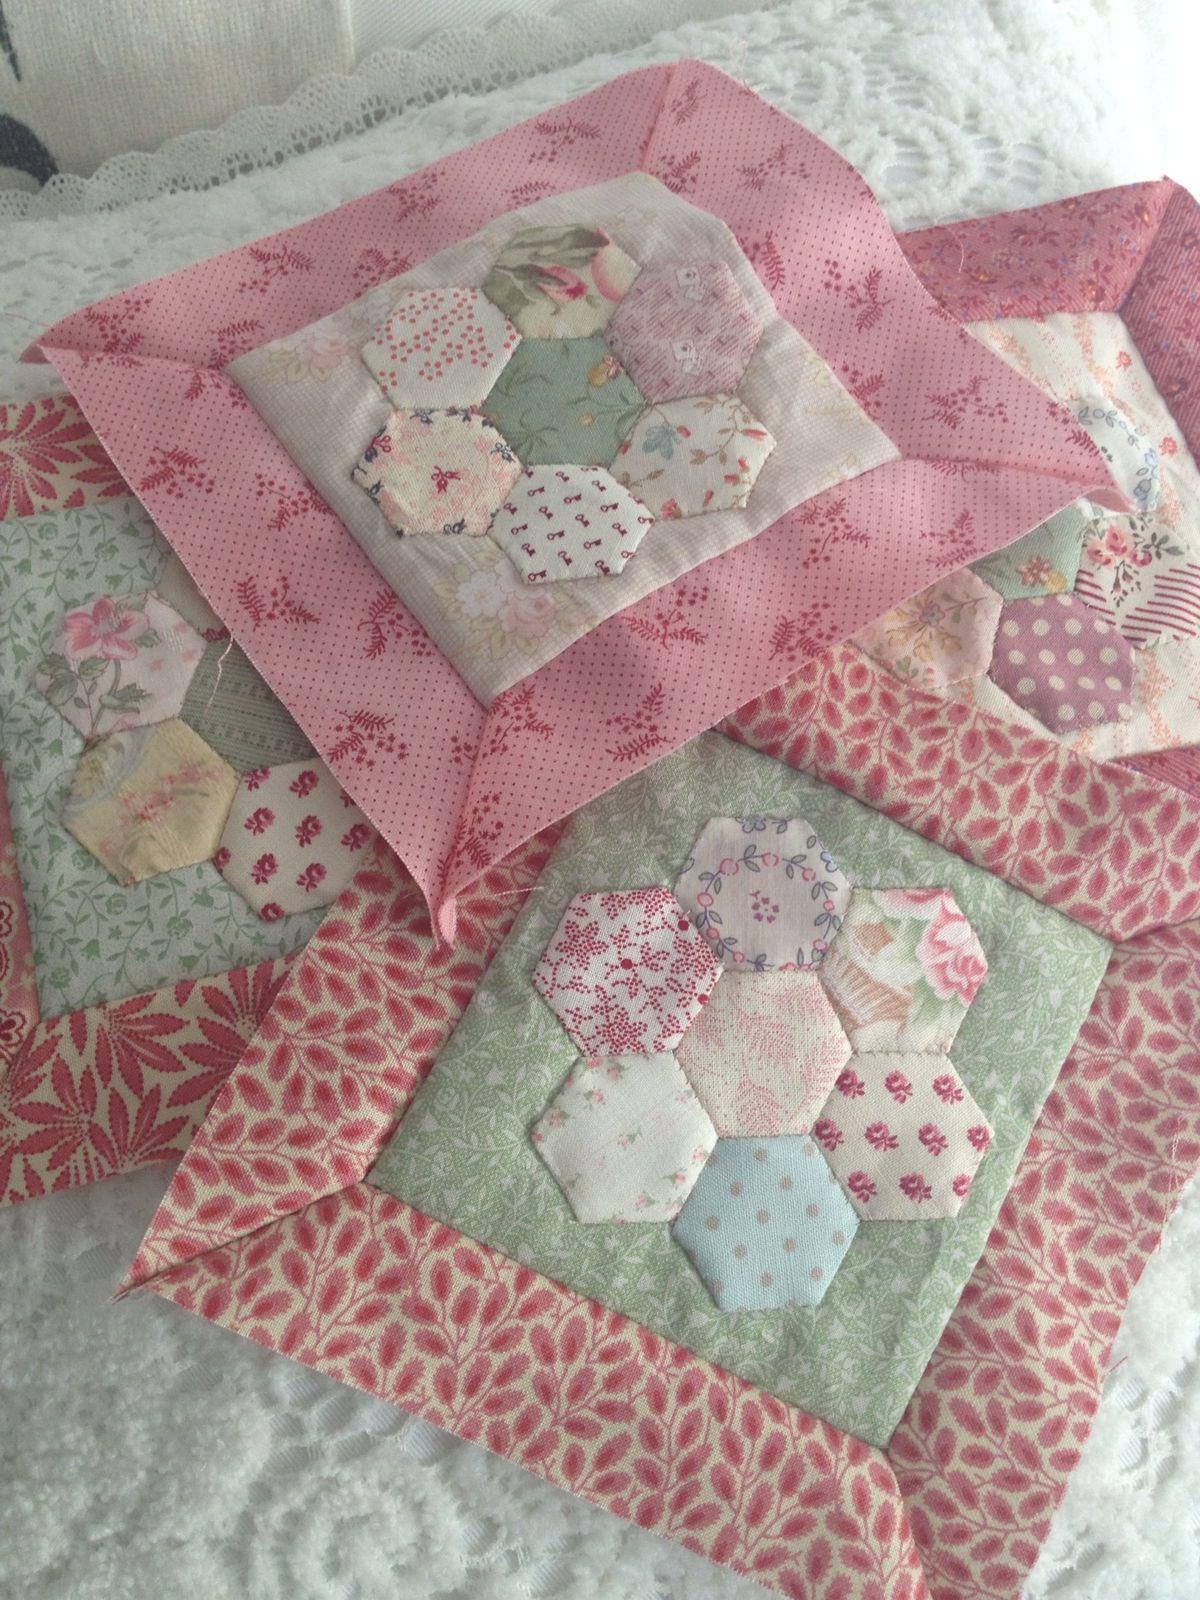 Pin von Cynthia Morrison auf Quilts, Quilts, Quilts | Pinterest ...